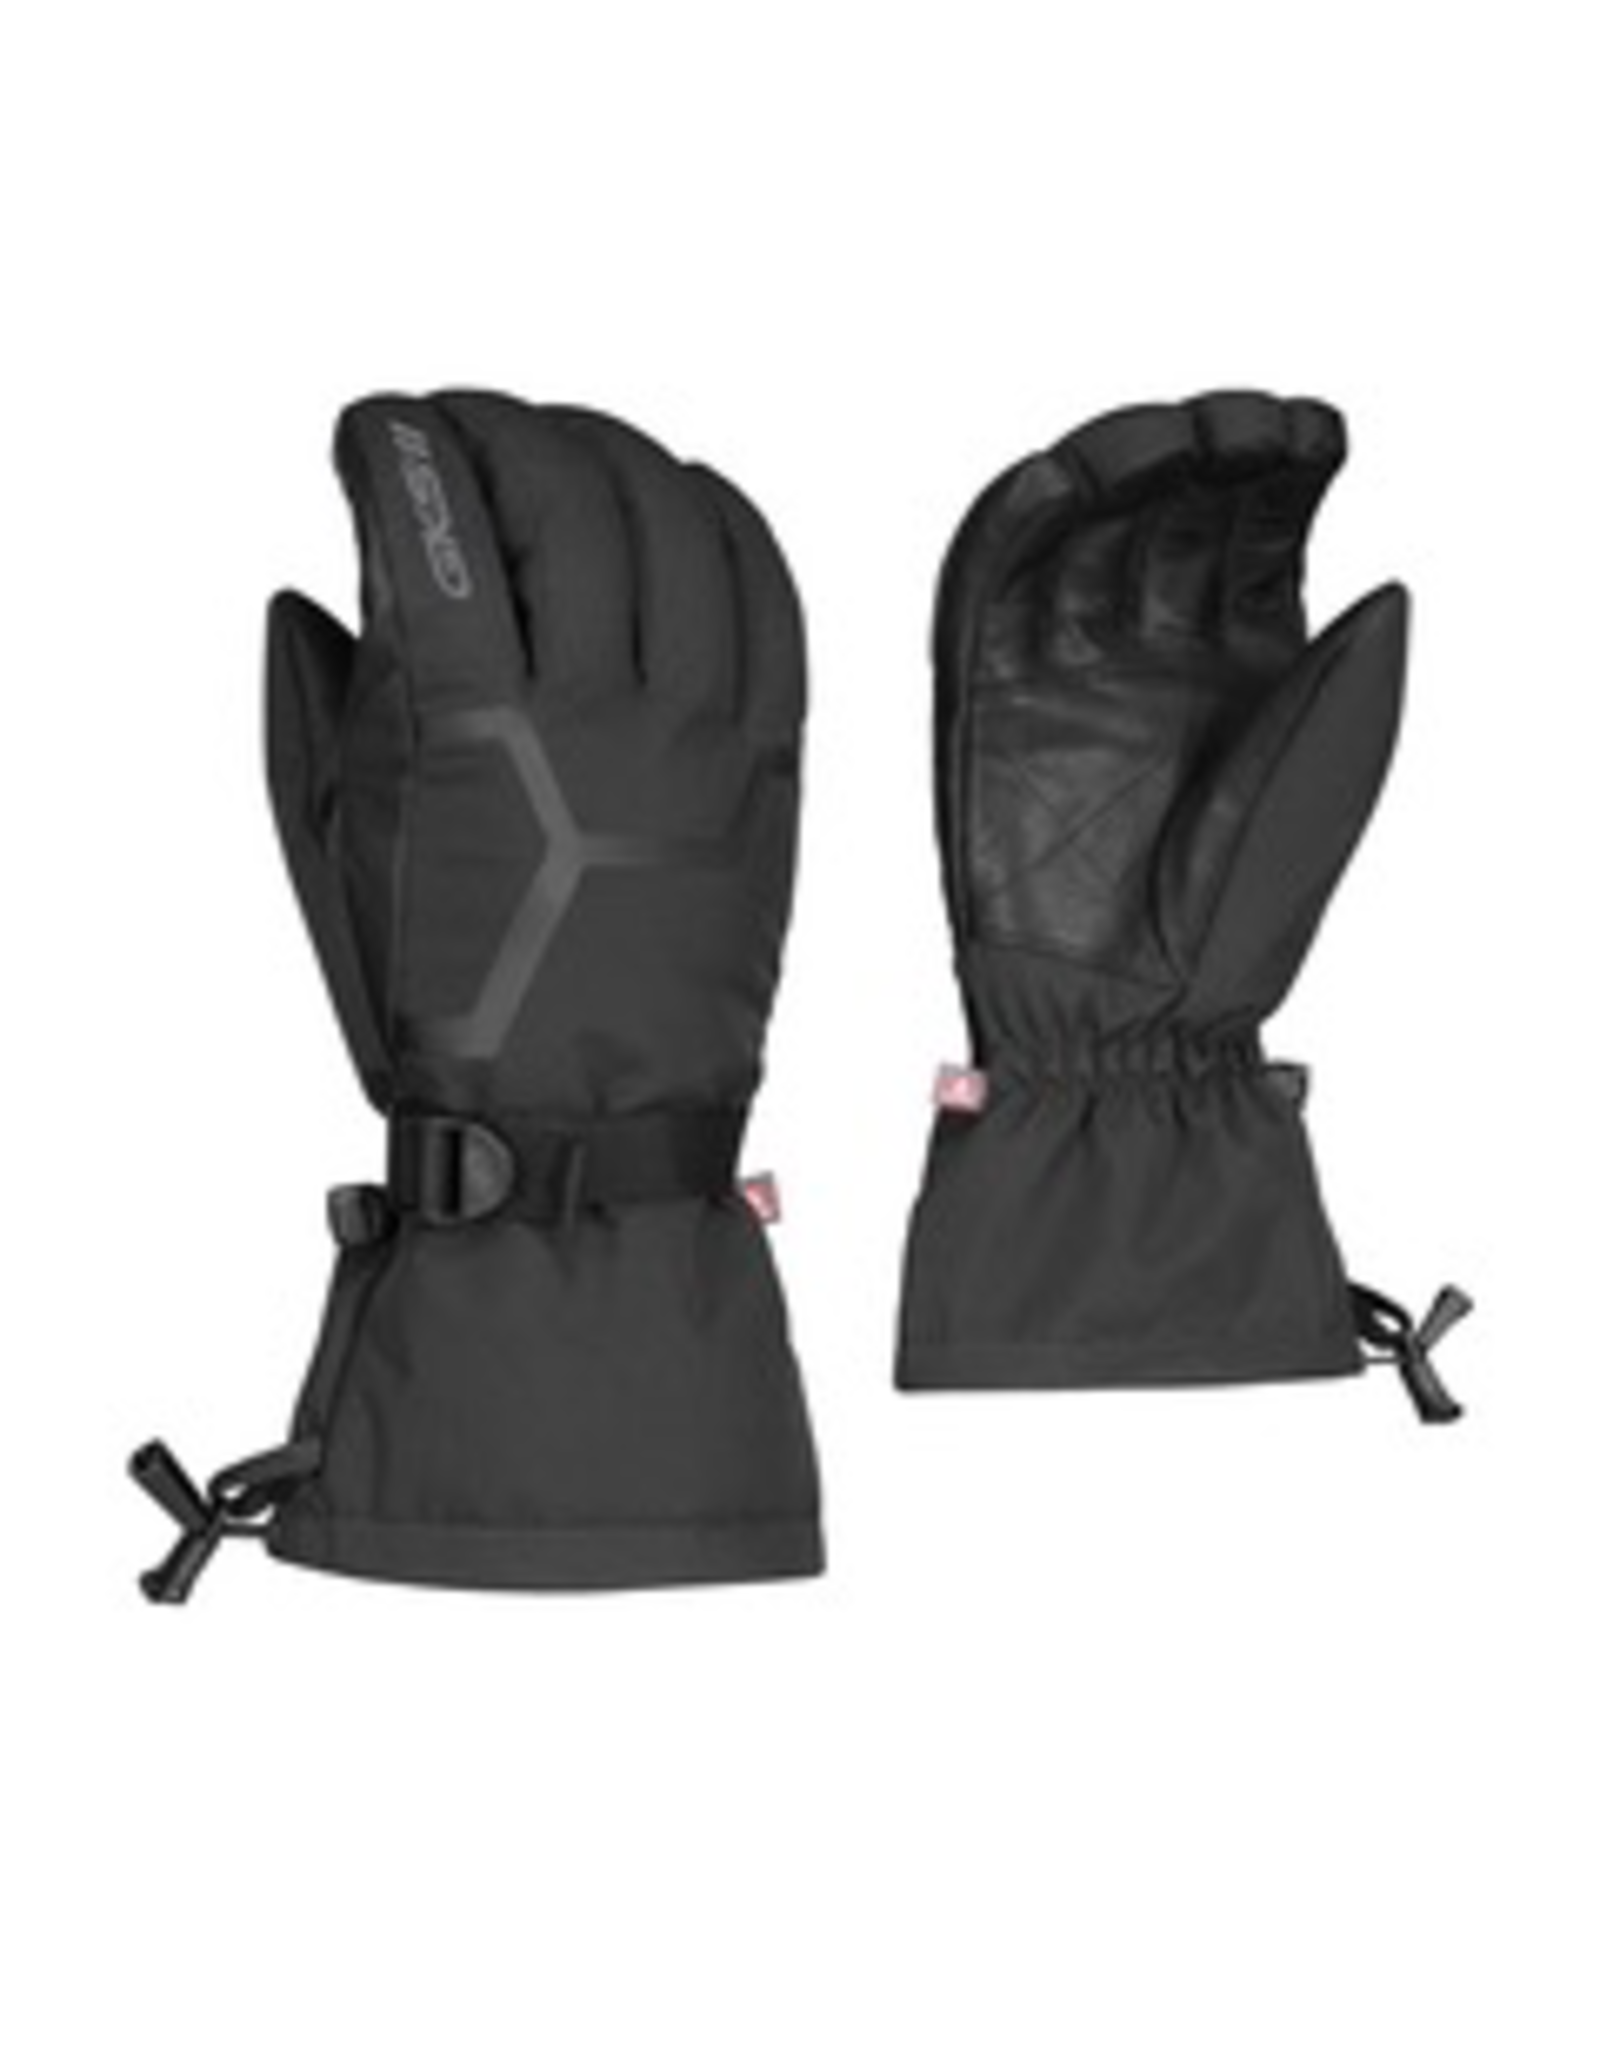 Garmin Ganka GKS Polyester Glove With Anti-Snow Strap